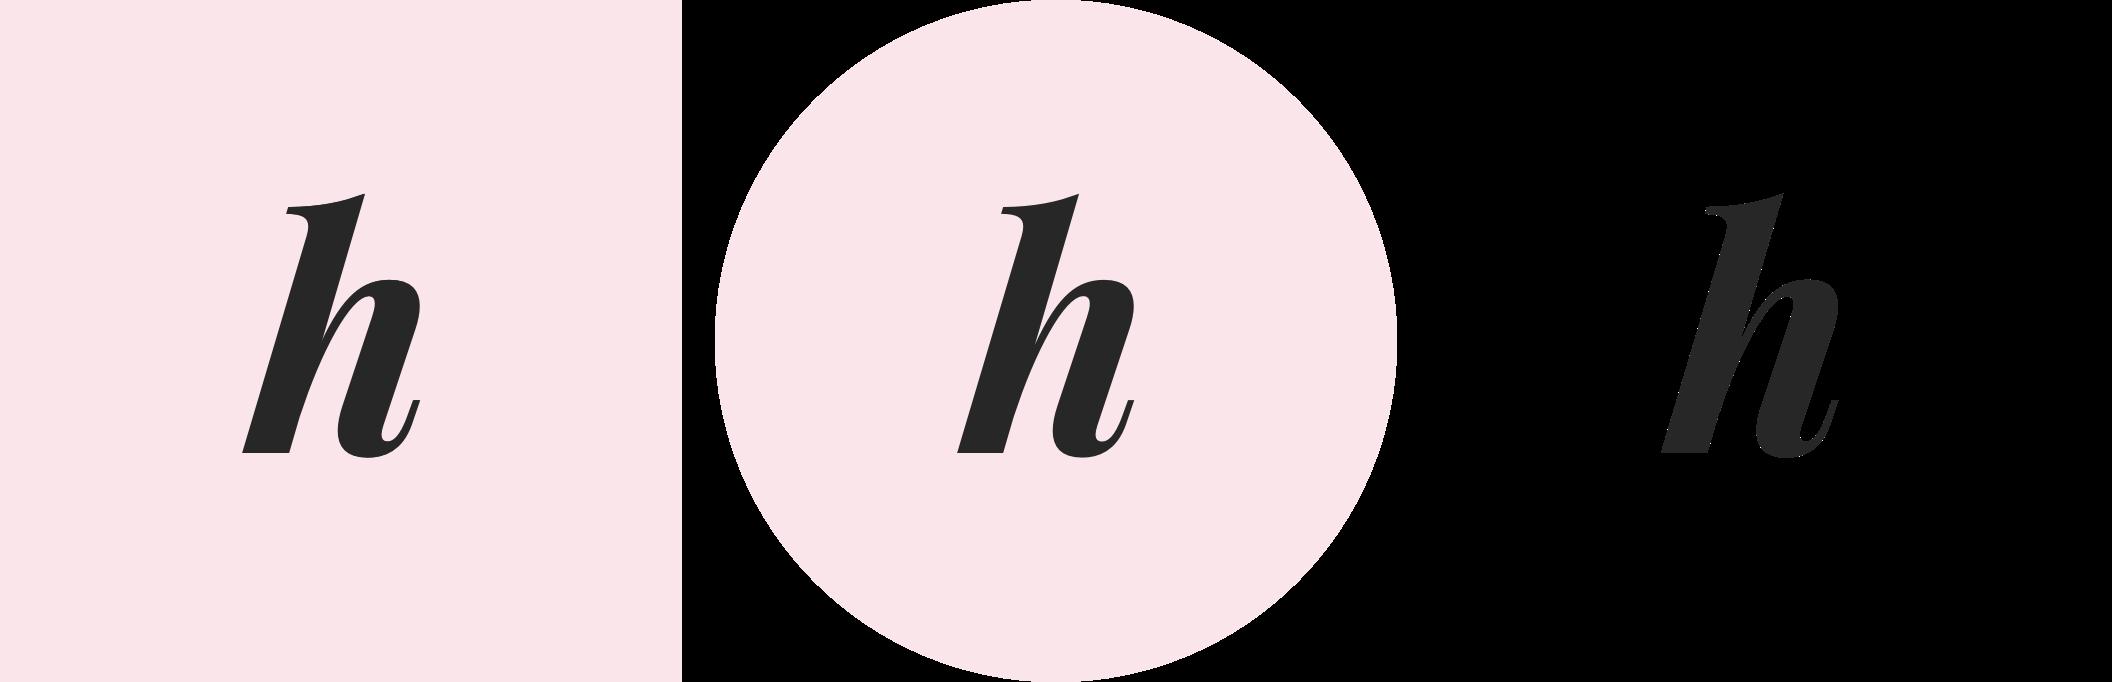 brand guide alternate logos.png